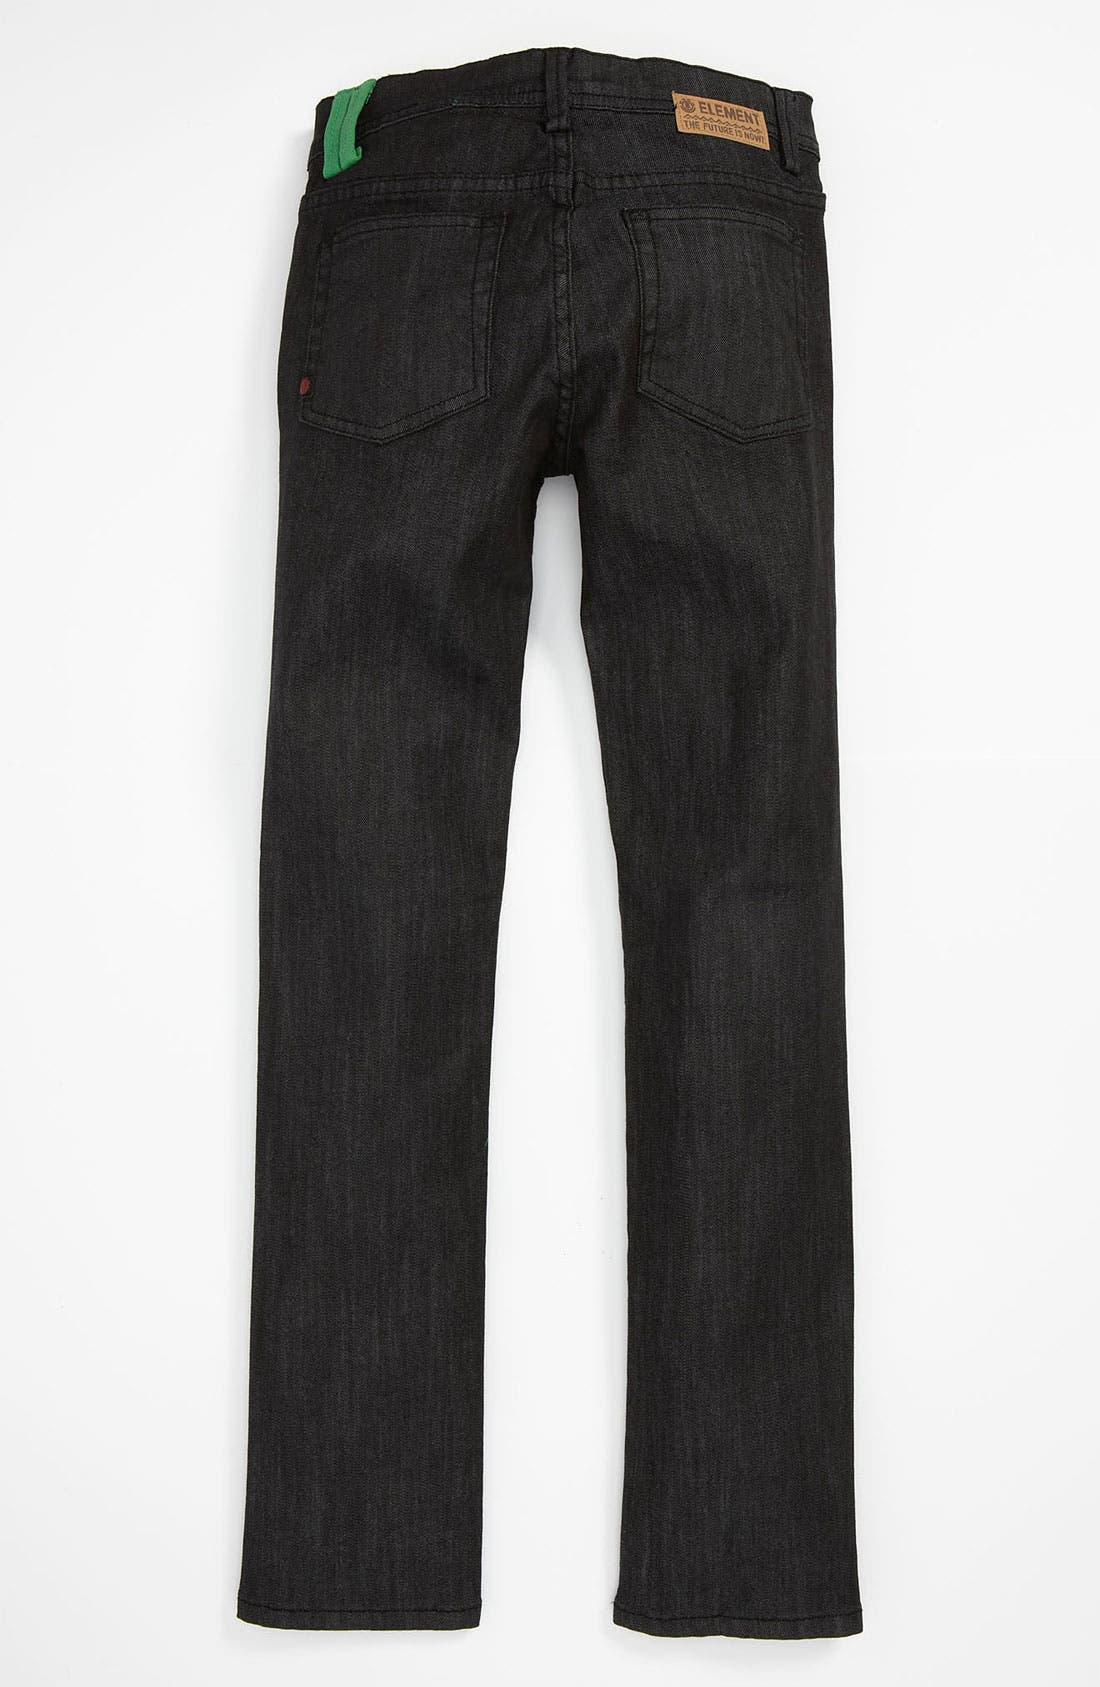 Main Image - Element 'Smith' Skinny Jeans (Big Boys)